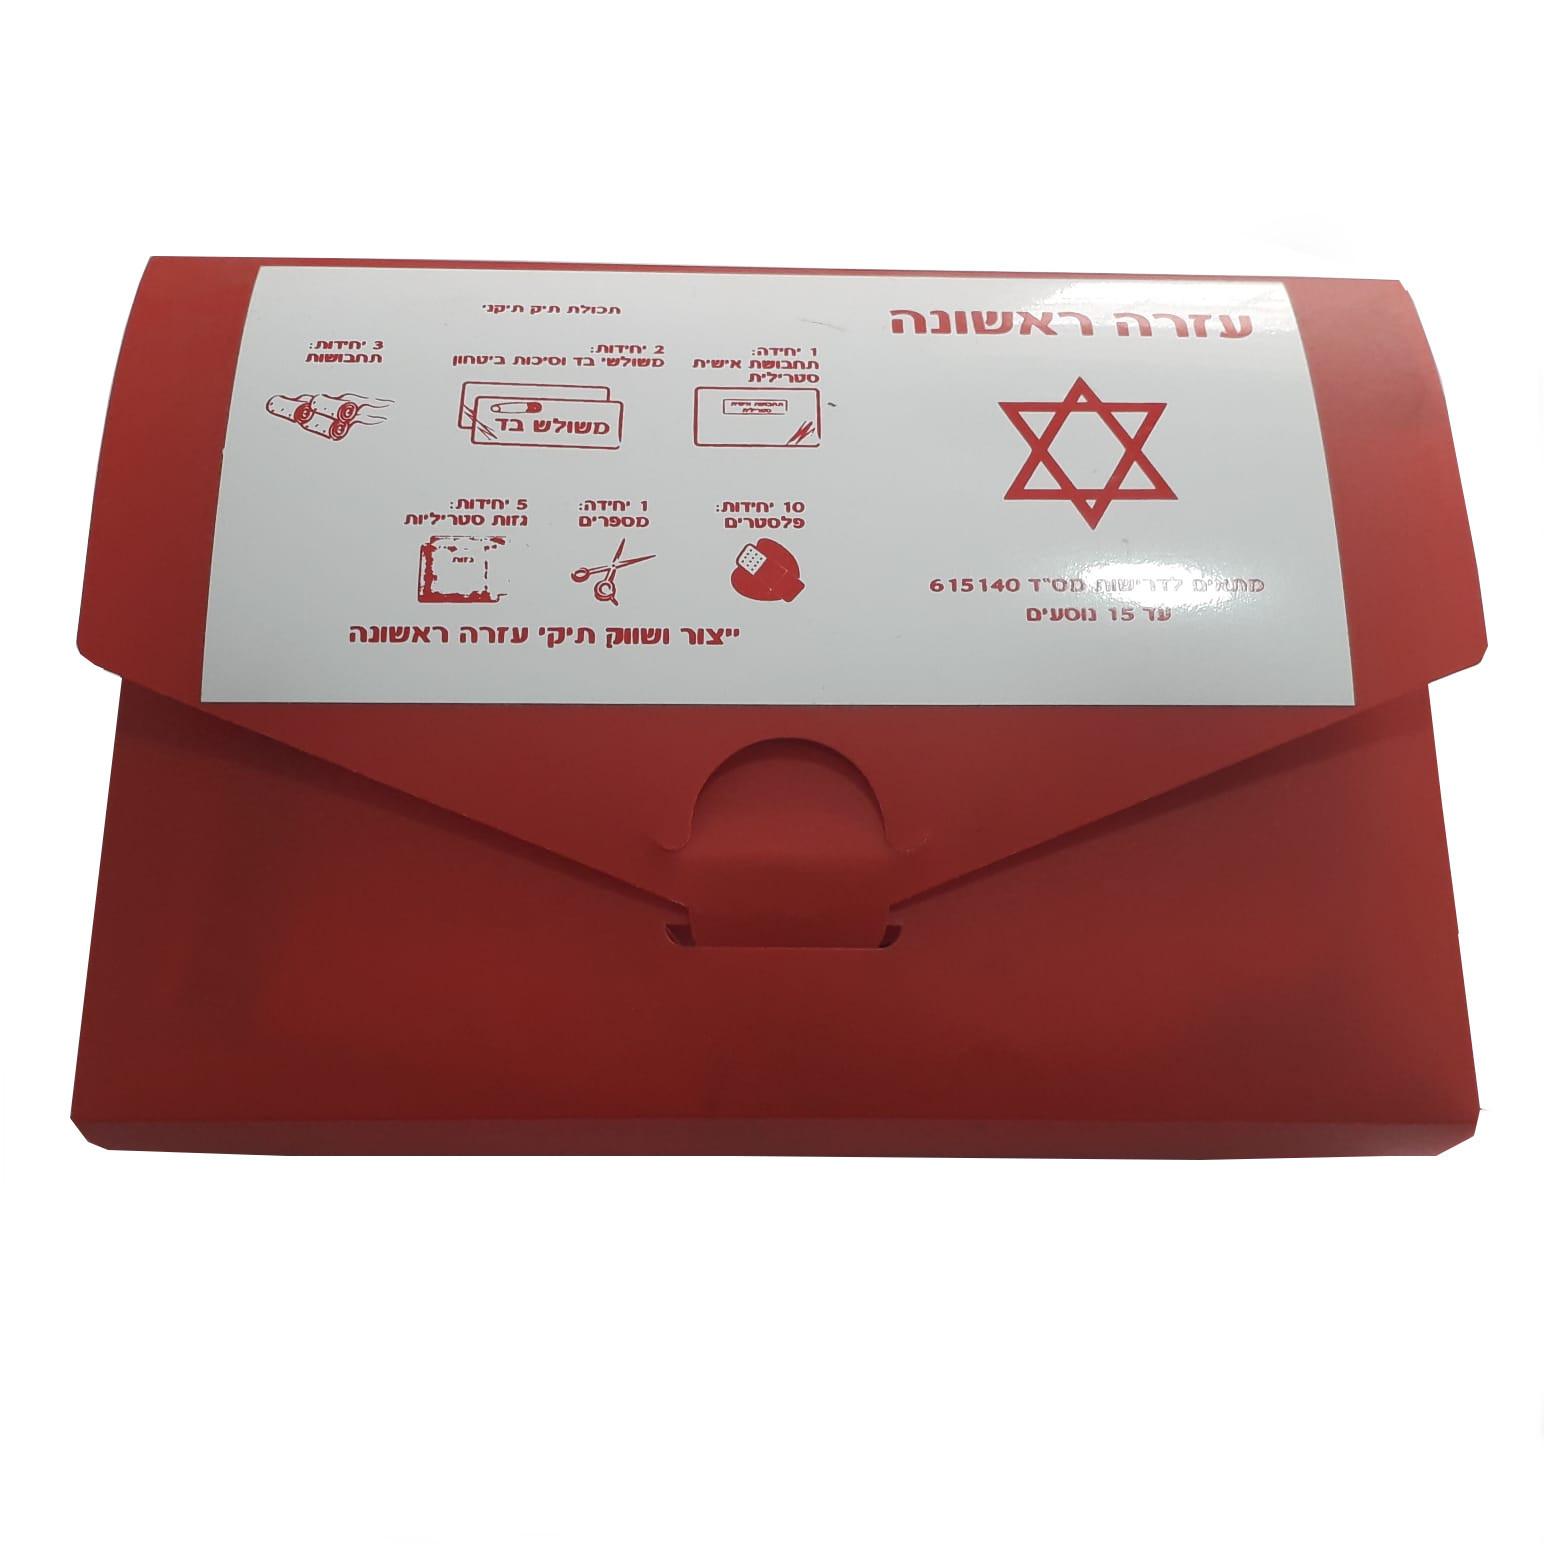 small first aid kit.jpeg